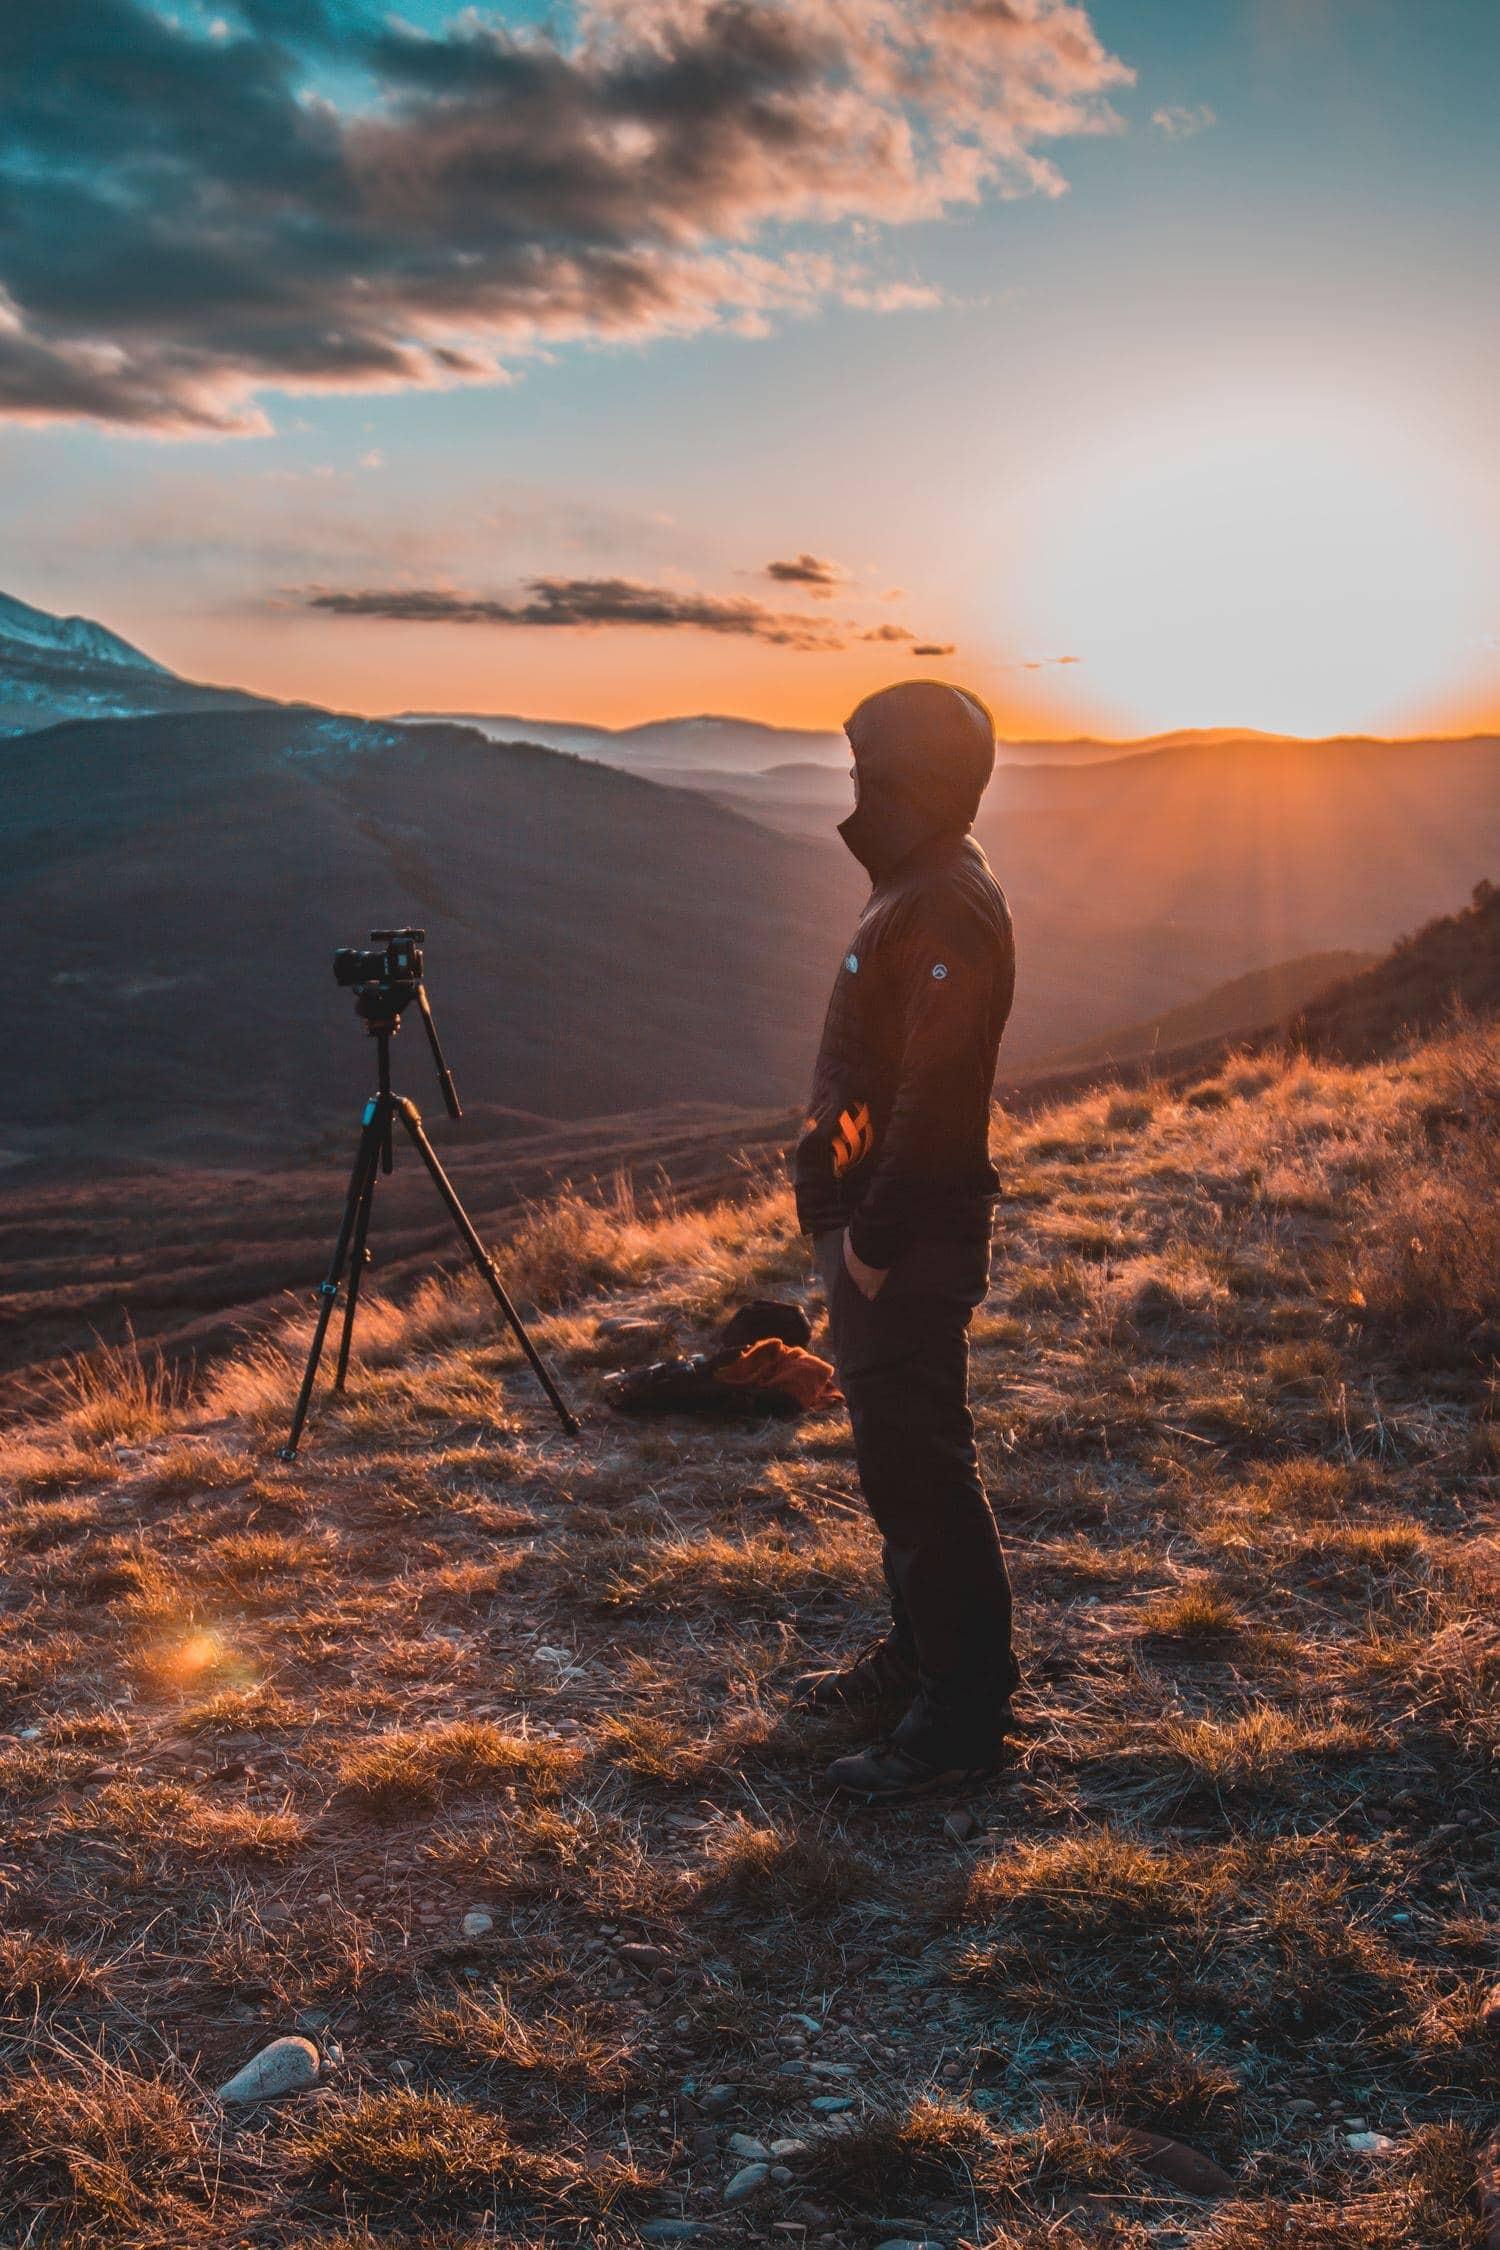 fotografía paisaje atardecer fotógrafo